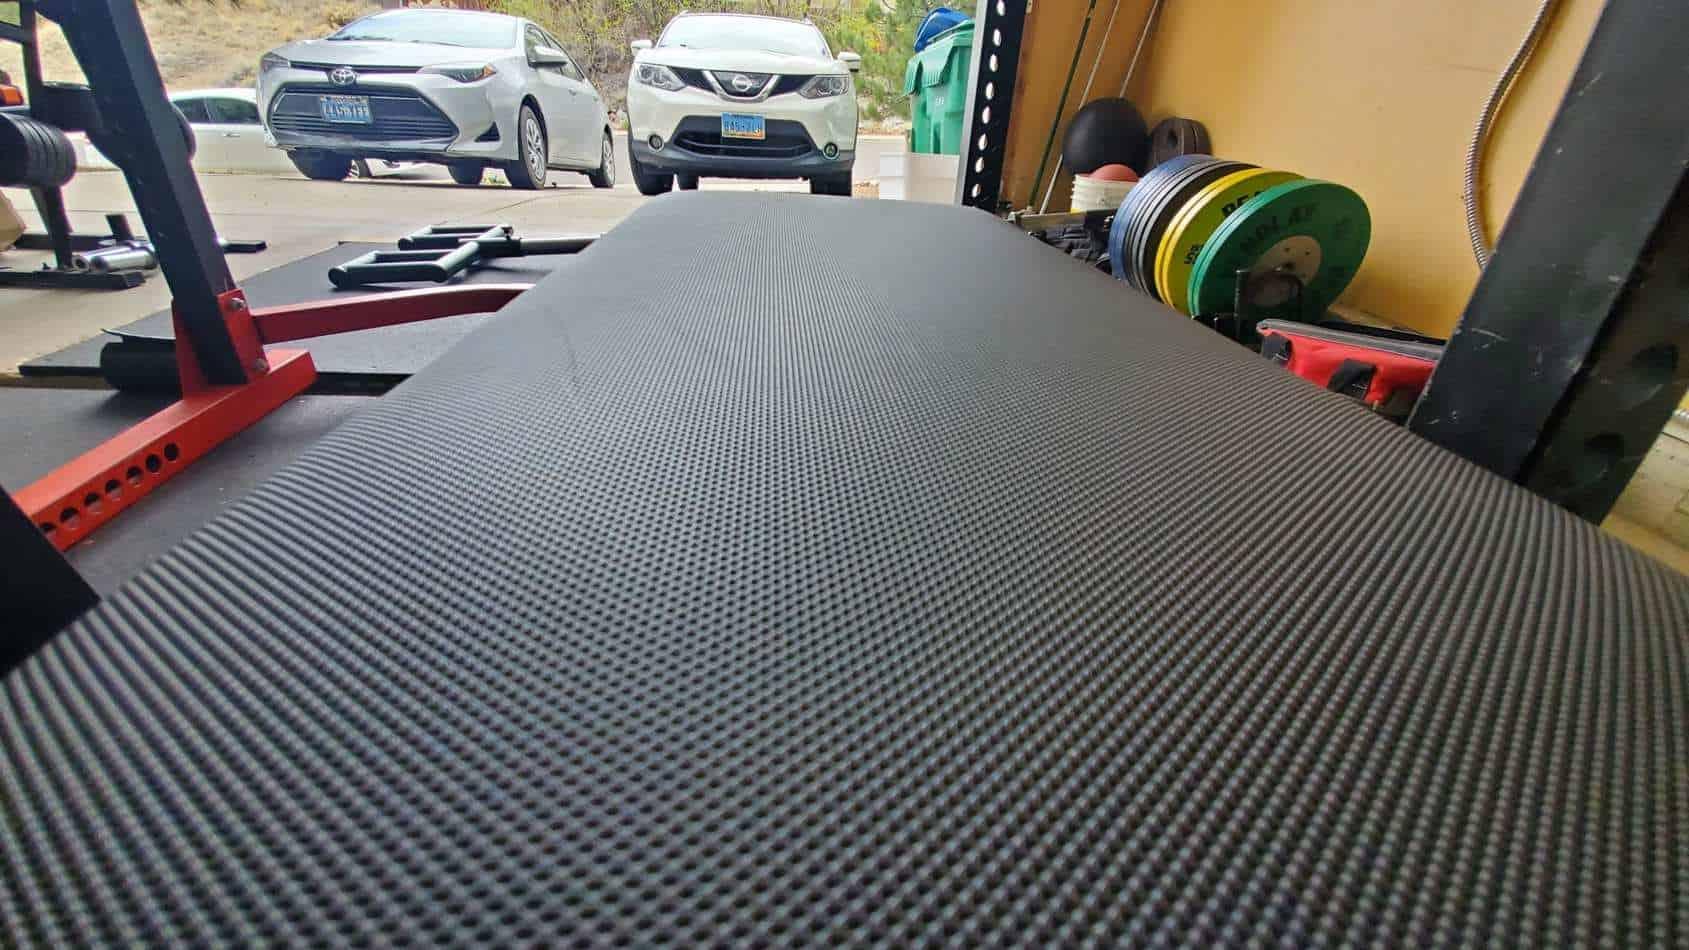 AB-5200 grippy vinyl ultra-dense foam core back pad